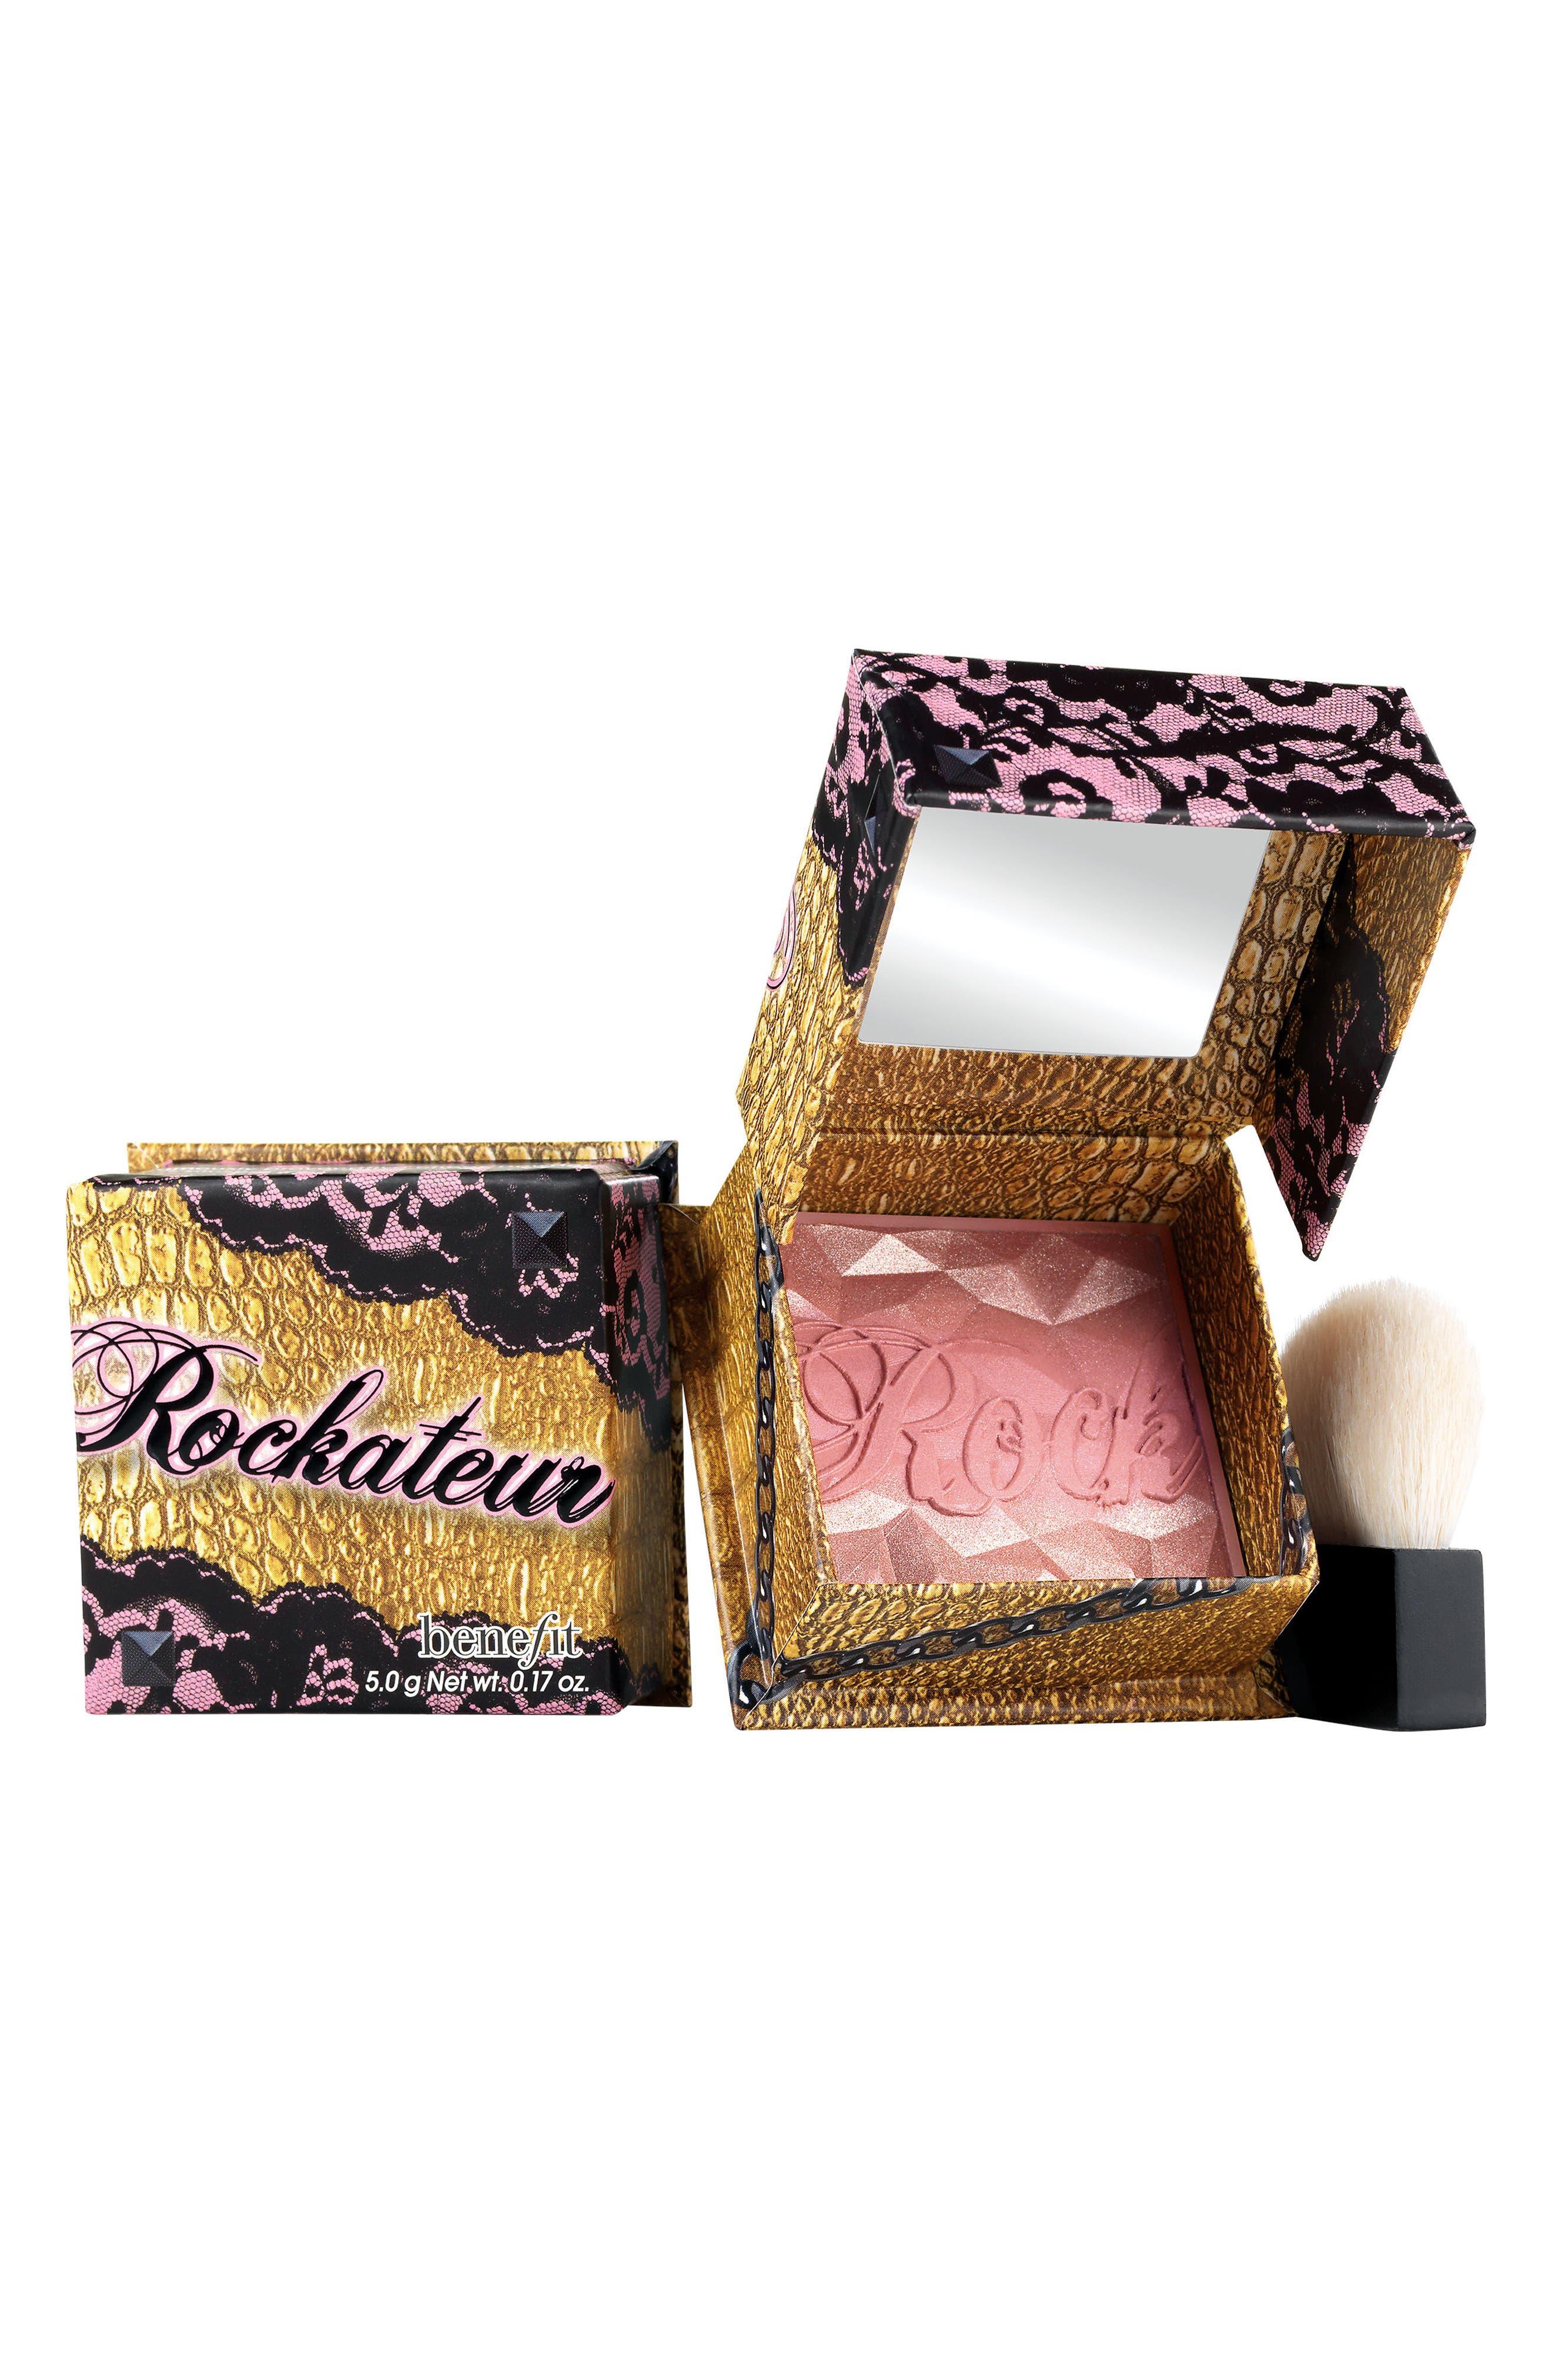 Benefit Rockateur Rose Gold Powder Blush